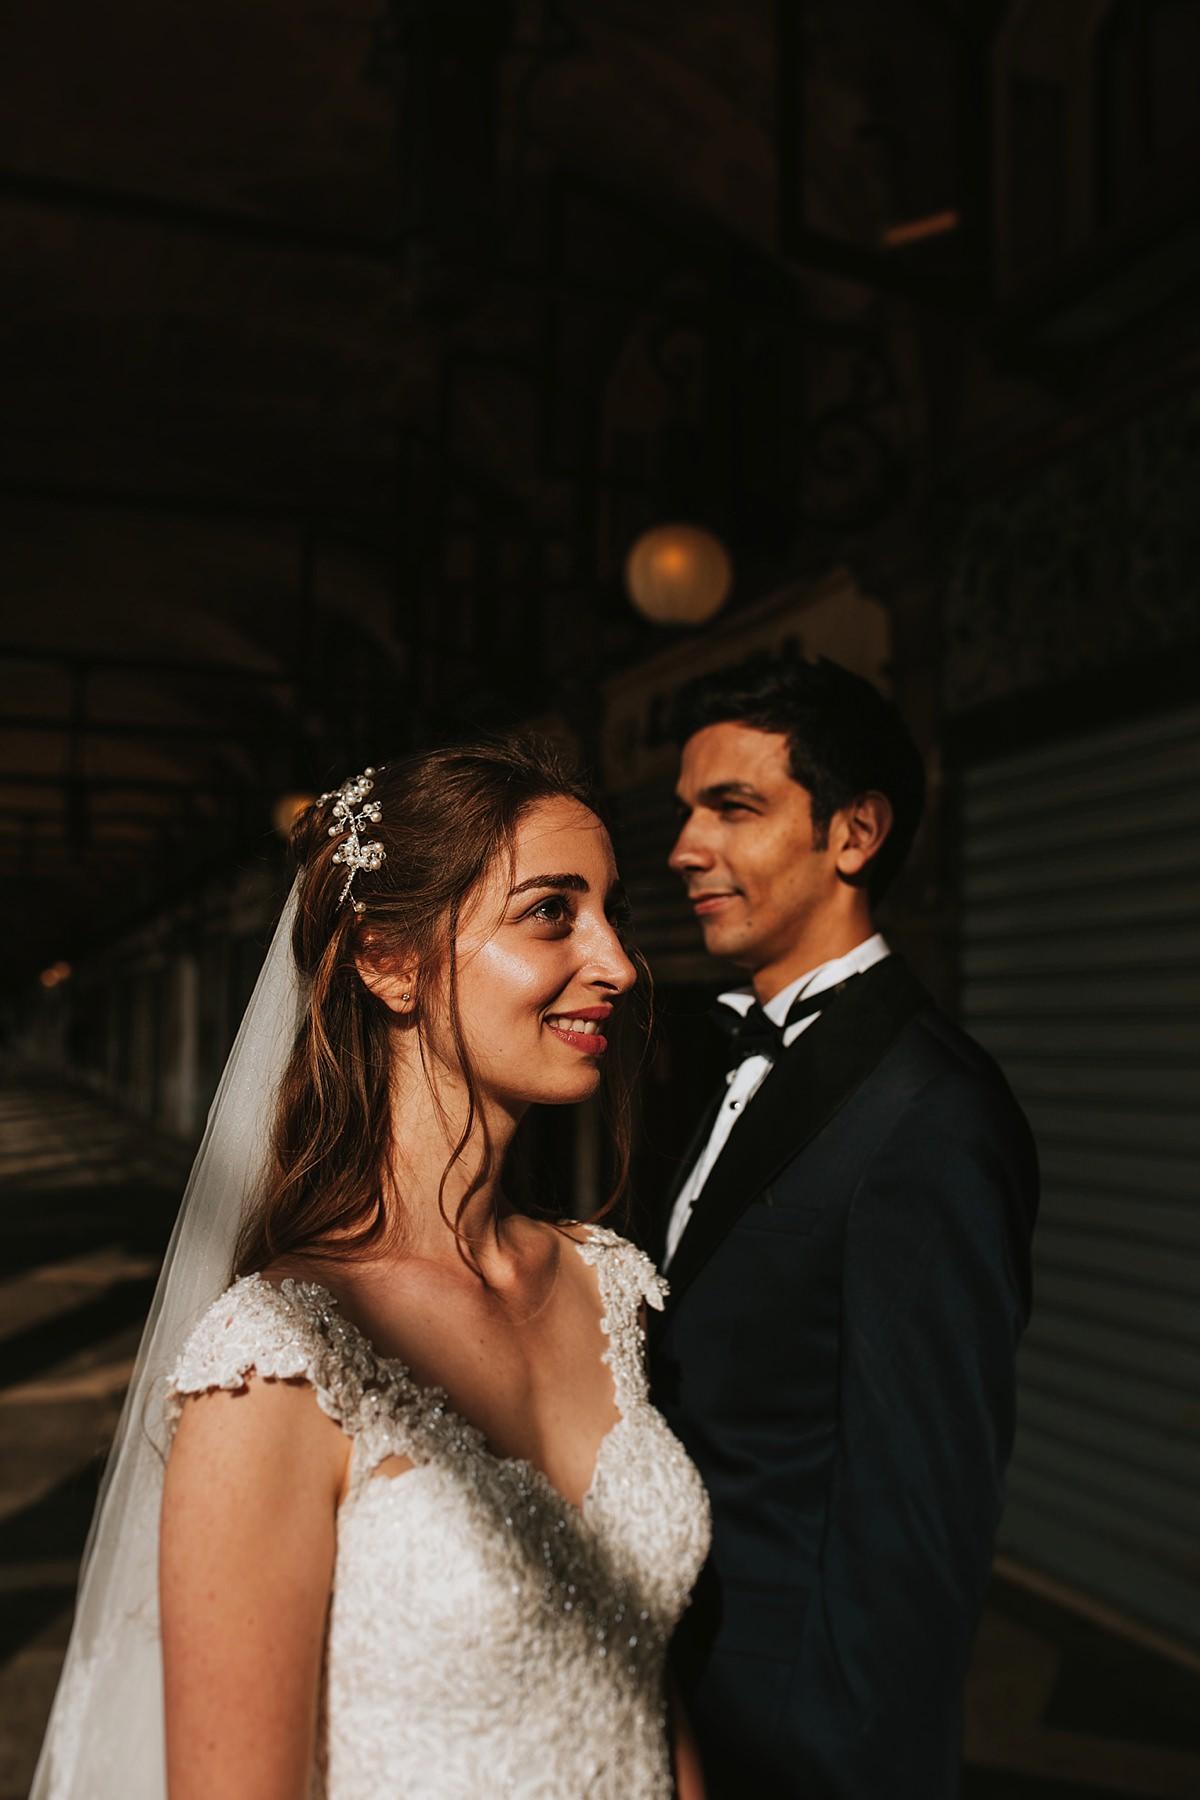 romantica-luna-di-miele-a-venezia_0052